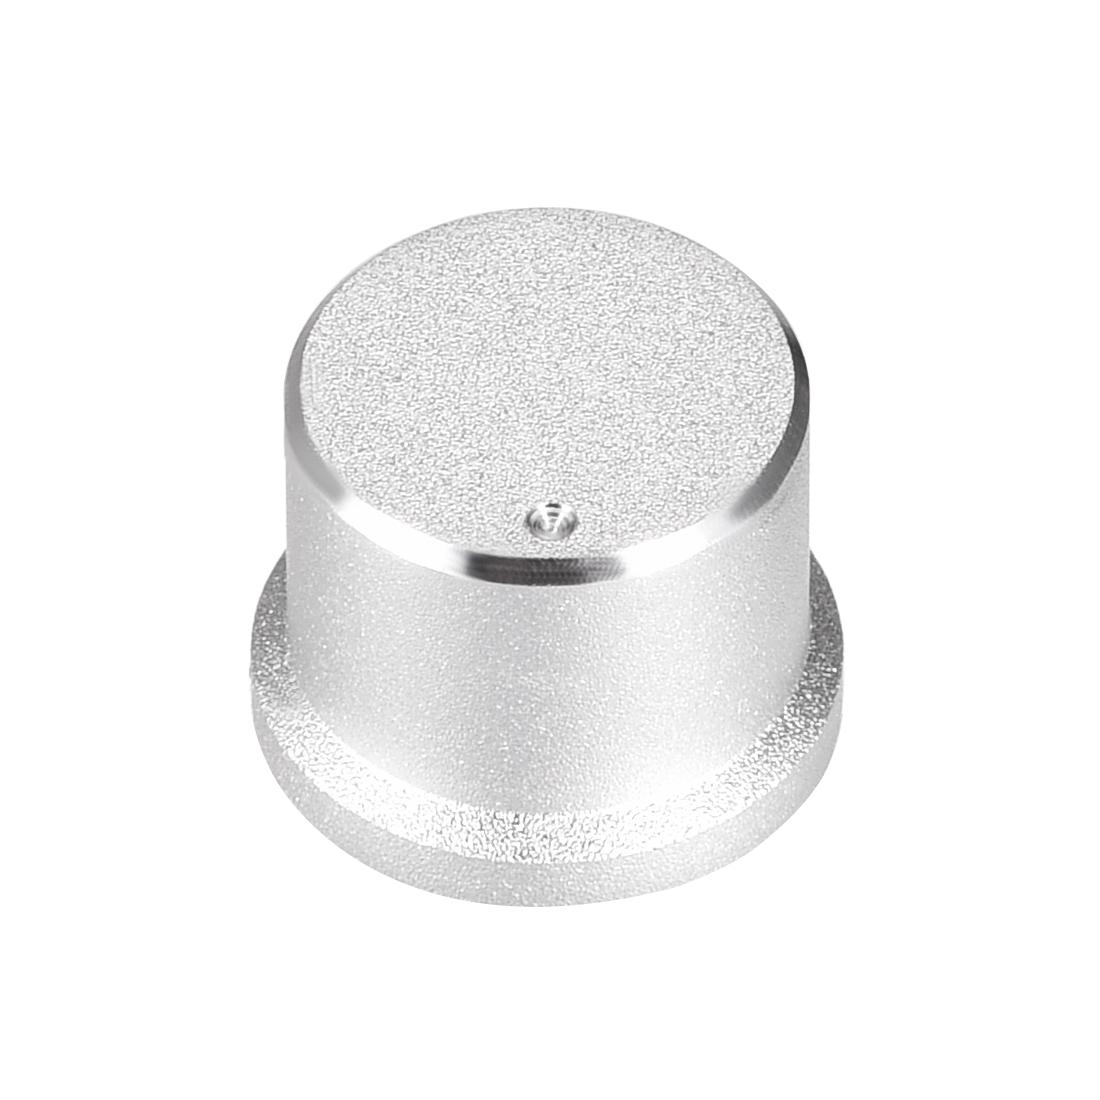 Stereo Knob, 16*6*12 mm Aluminium Alloy, Volume Control Knobs, Sliver